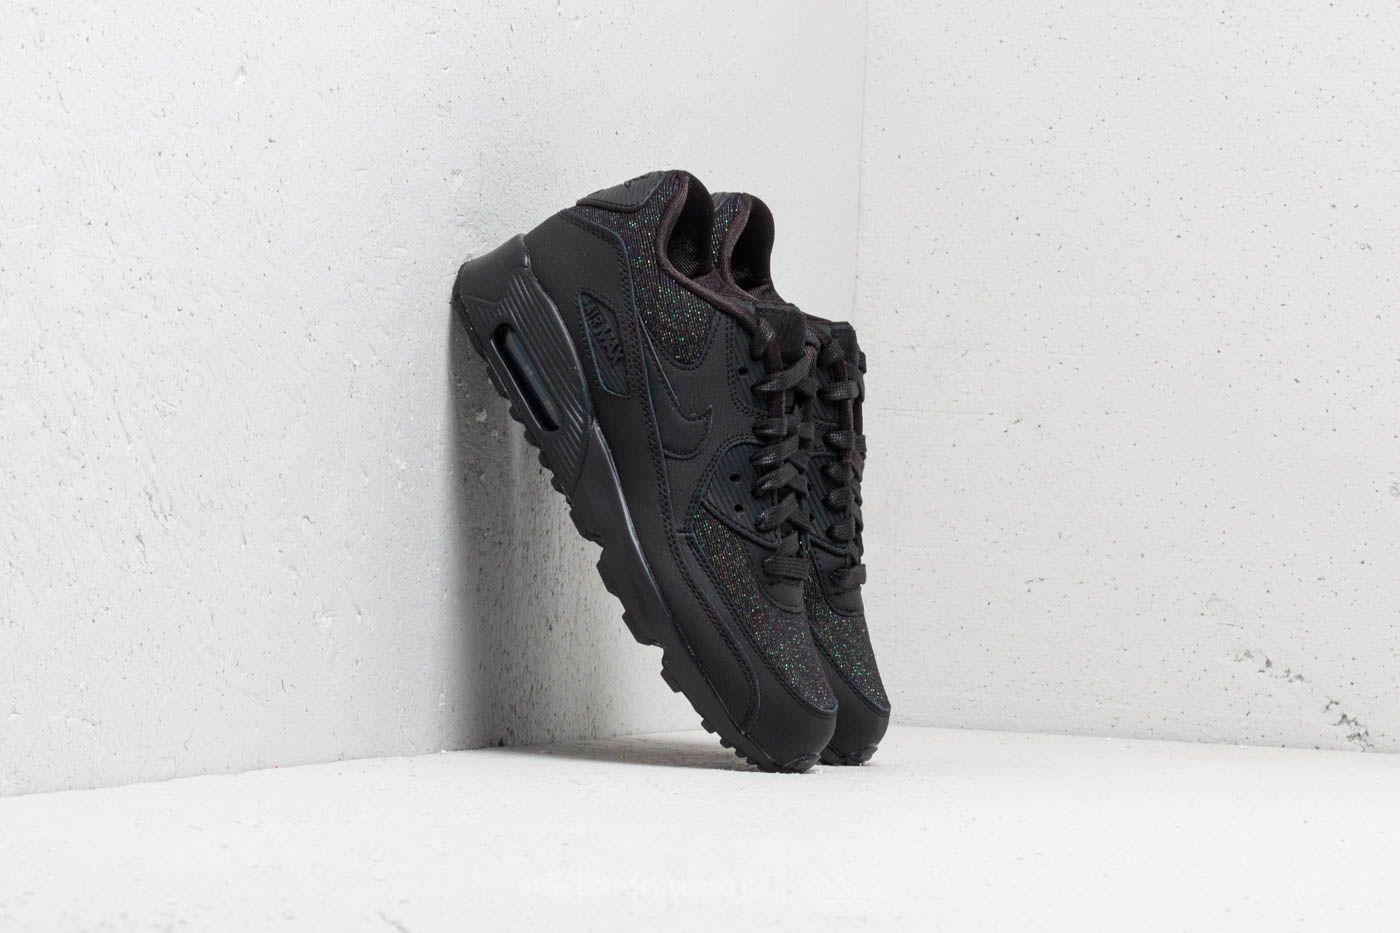 la meilleure attitude 30edc e4323 Nike Air Max 90 SE Mesh (GS) Black/ Black-Anthracite | Footshop